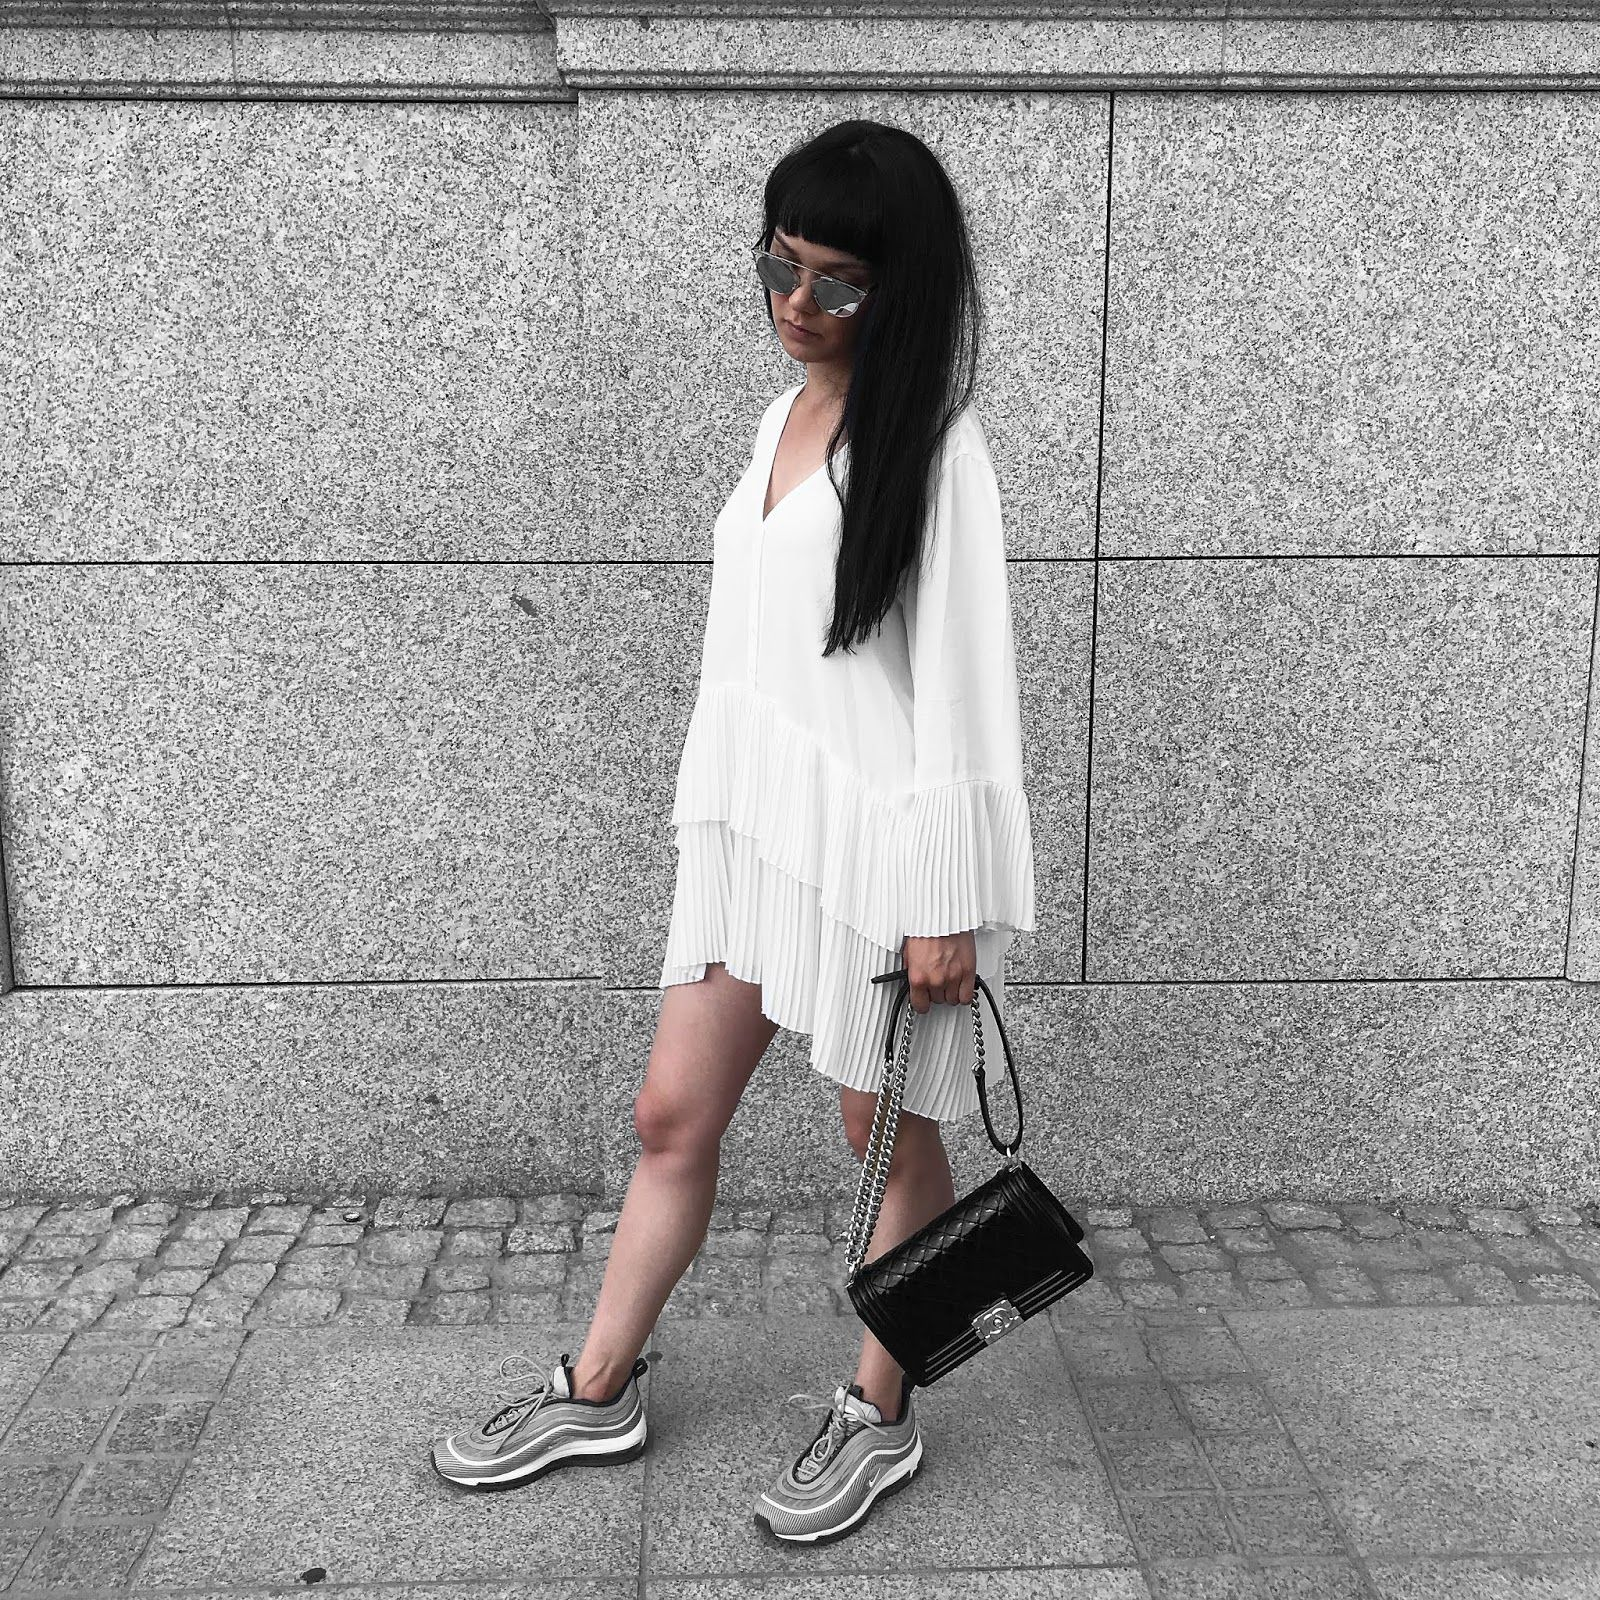 Outfit nike air max zara black skort fashion land | Outfit